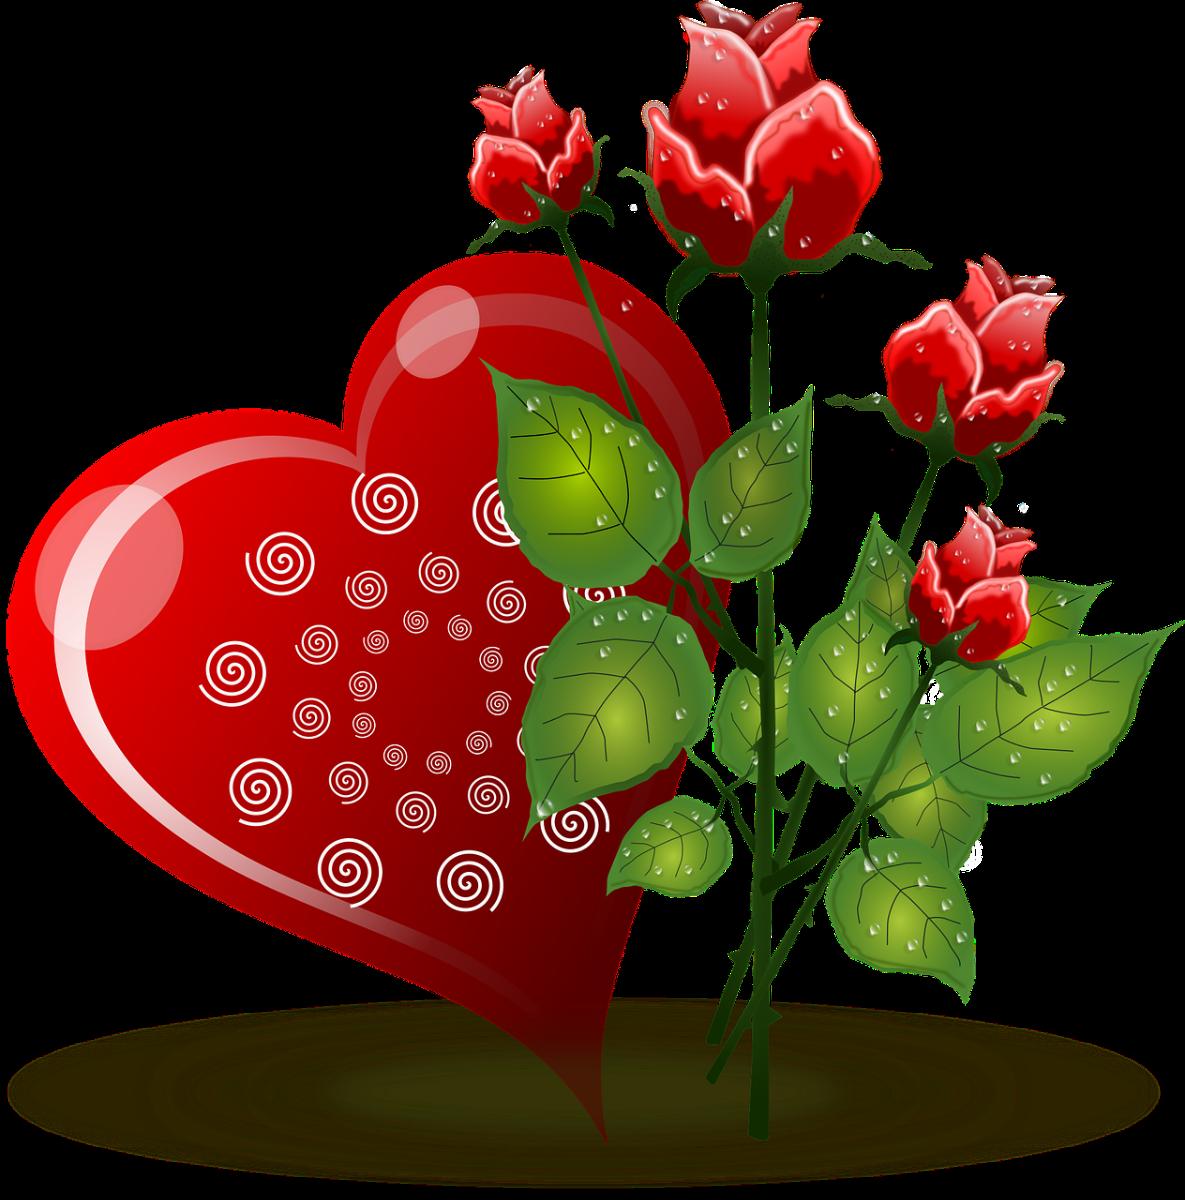 flowers-1295512_1280_1